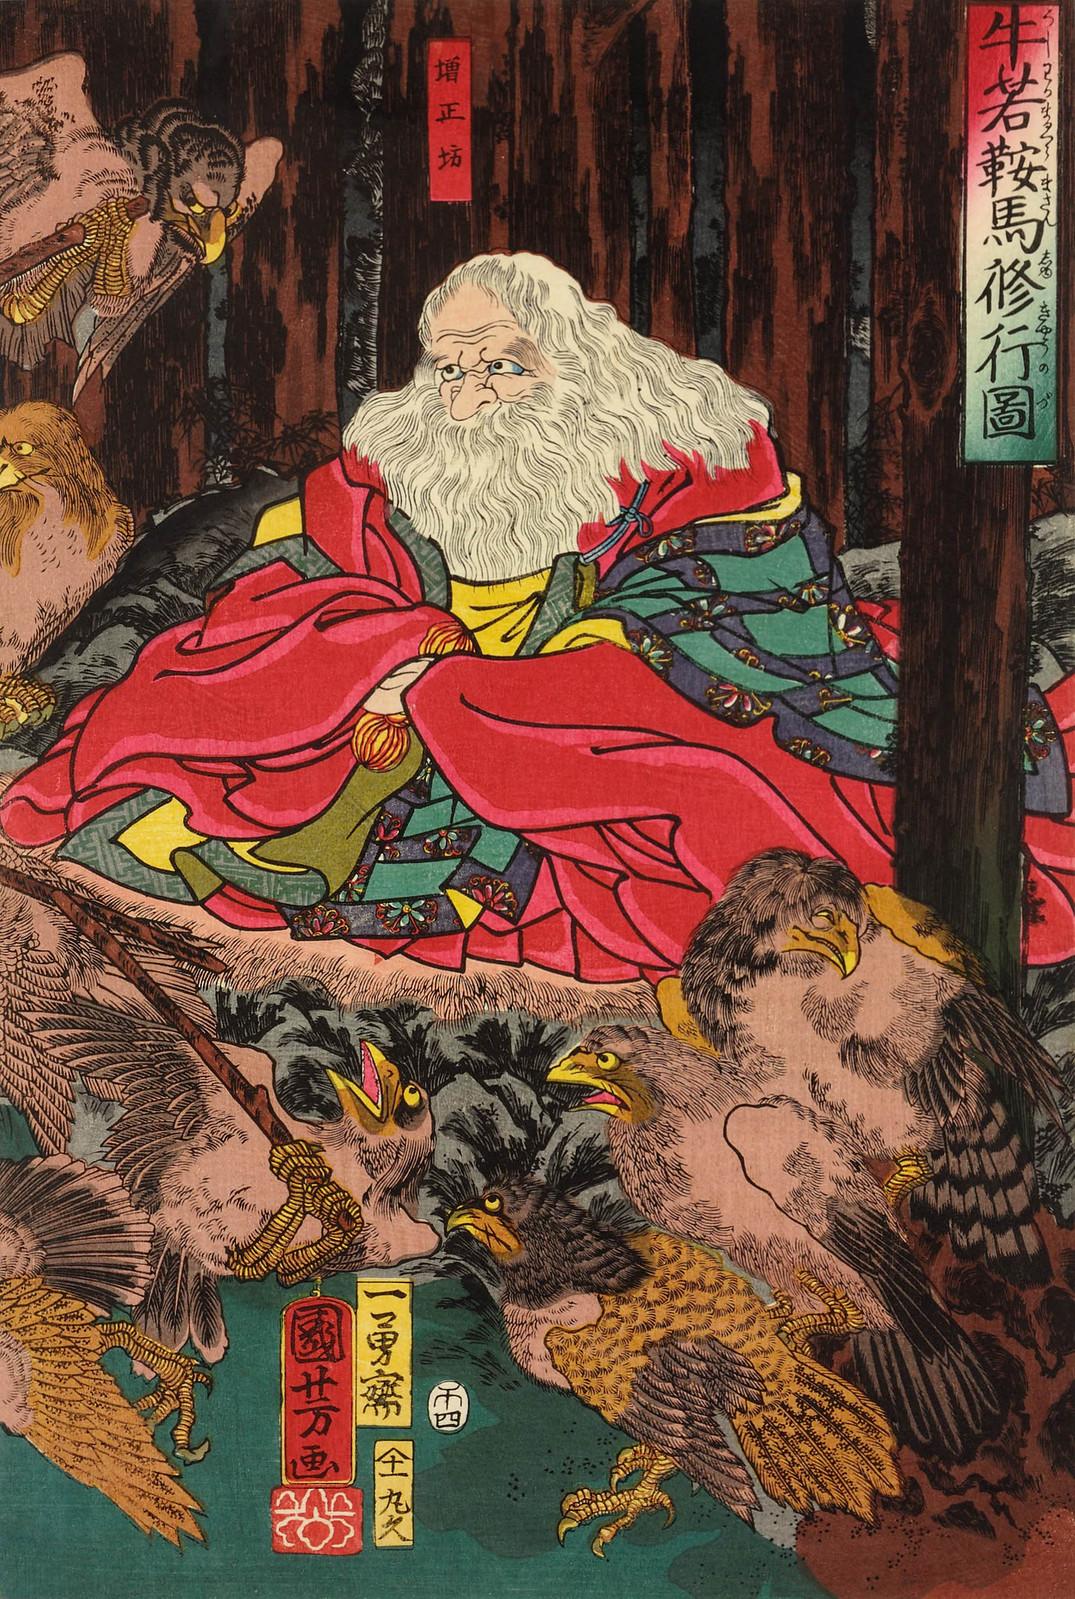 Utagawa Kuniyoshi - Ushiwaka Kurama shugyo zu, 1858 (middle panel)